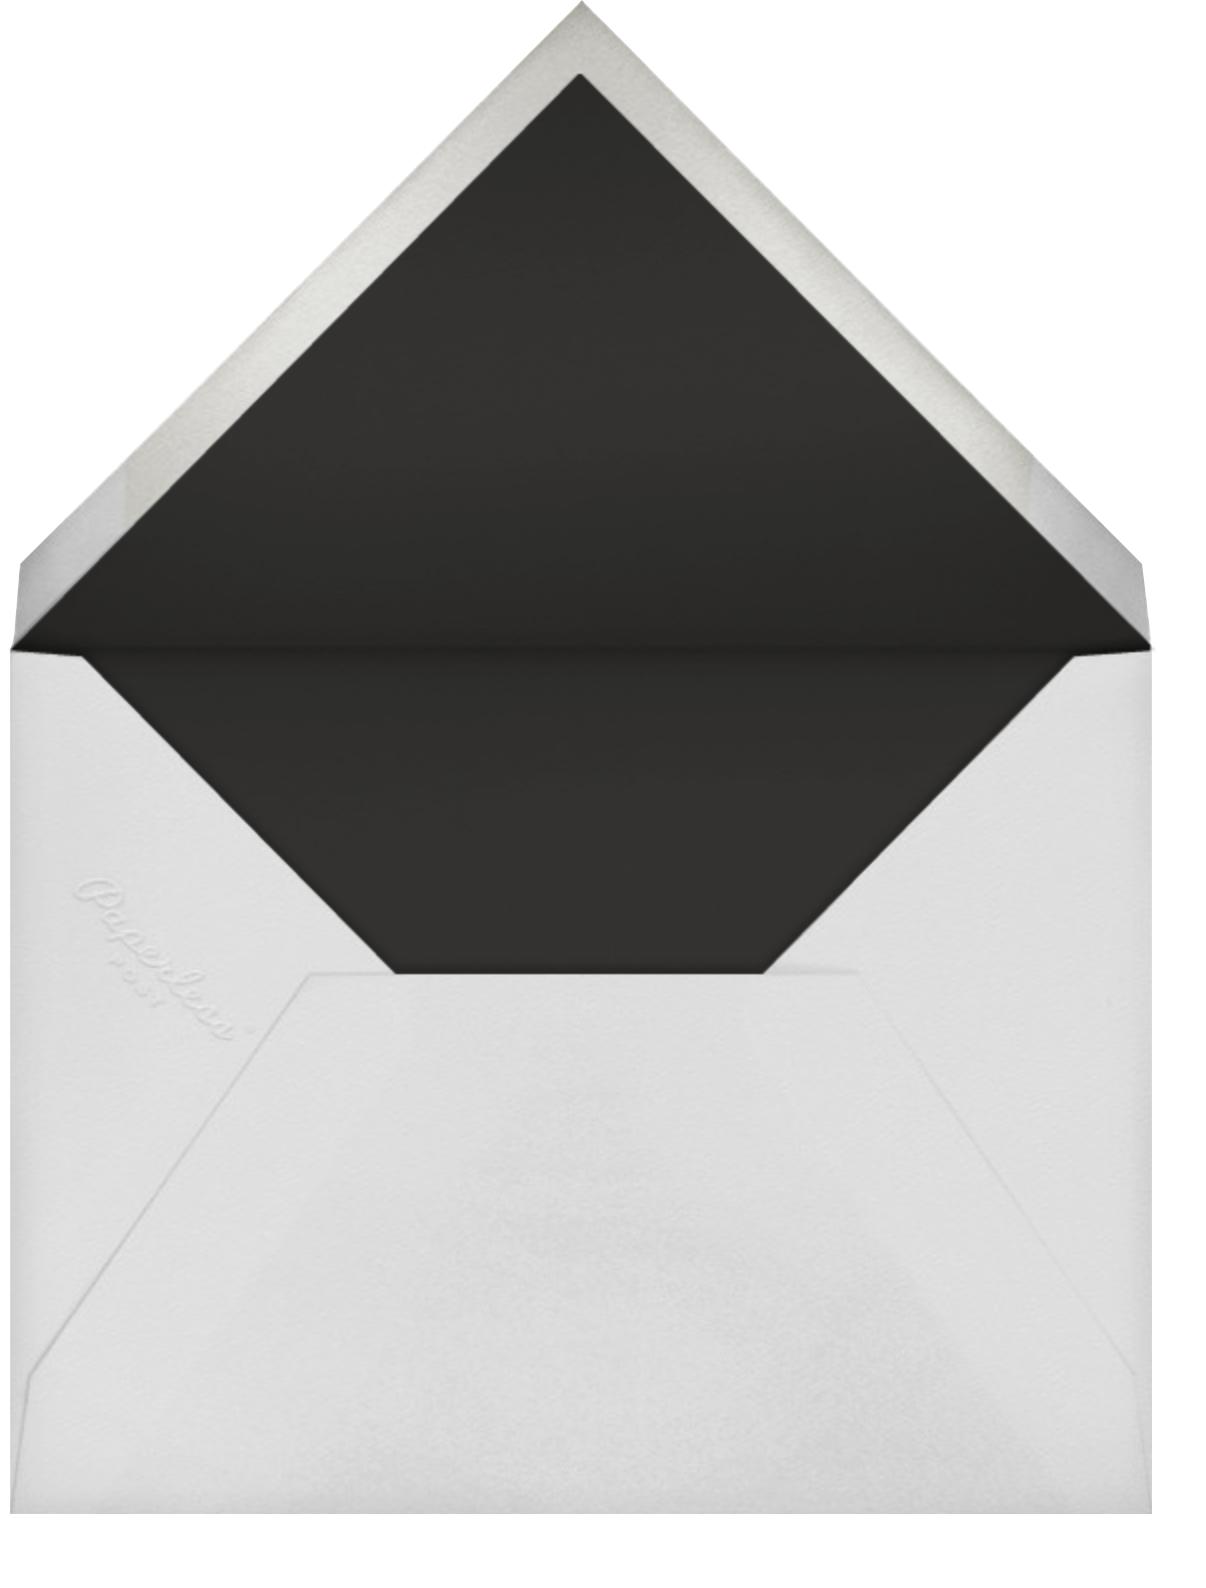 Ruffle (Stationery) - Black - Vera Wang - Personalized stationery - envelope back